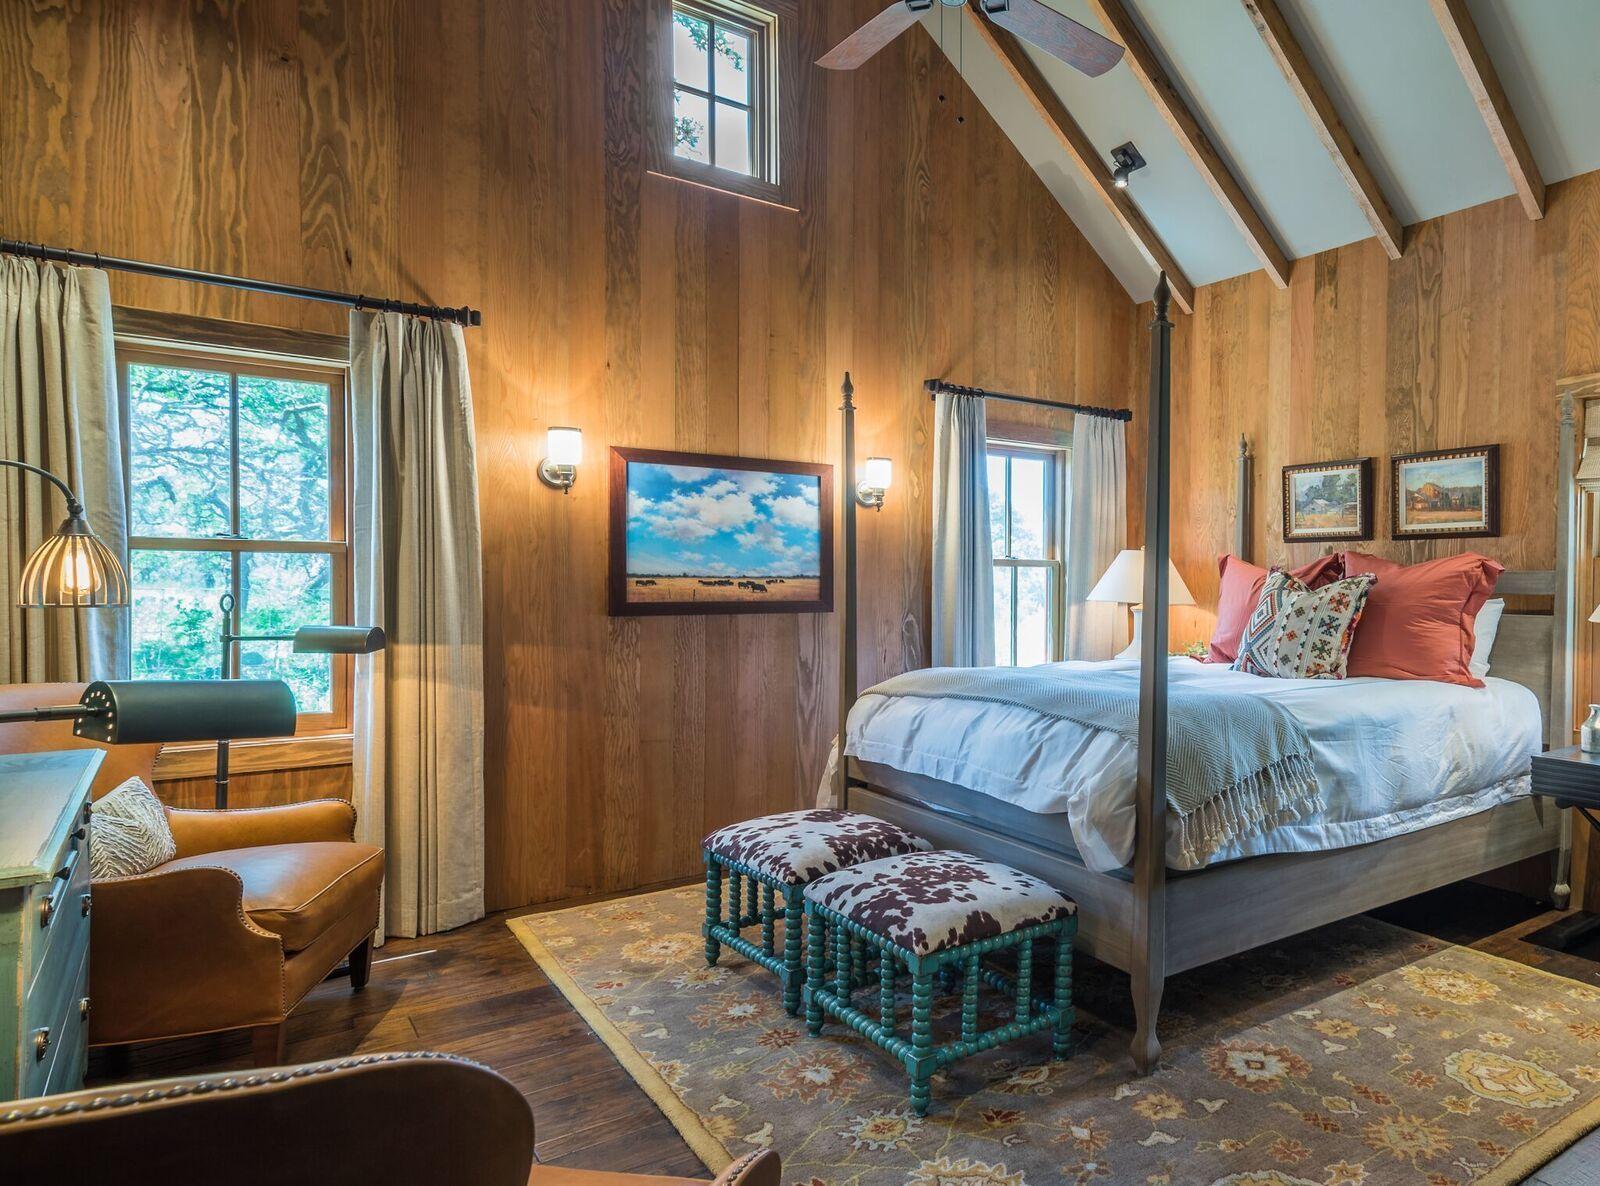 Master bedroom ideas interior design styles inspiration luxury homes open concept dream home interiors also rh pinterest